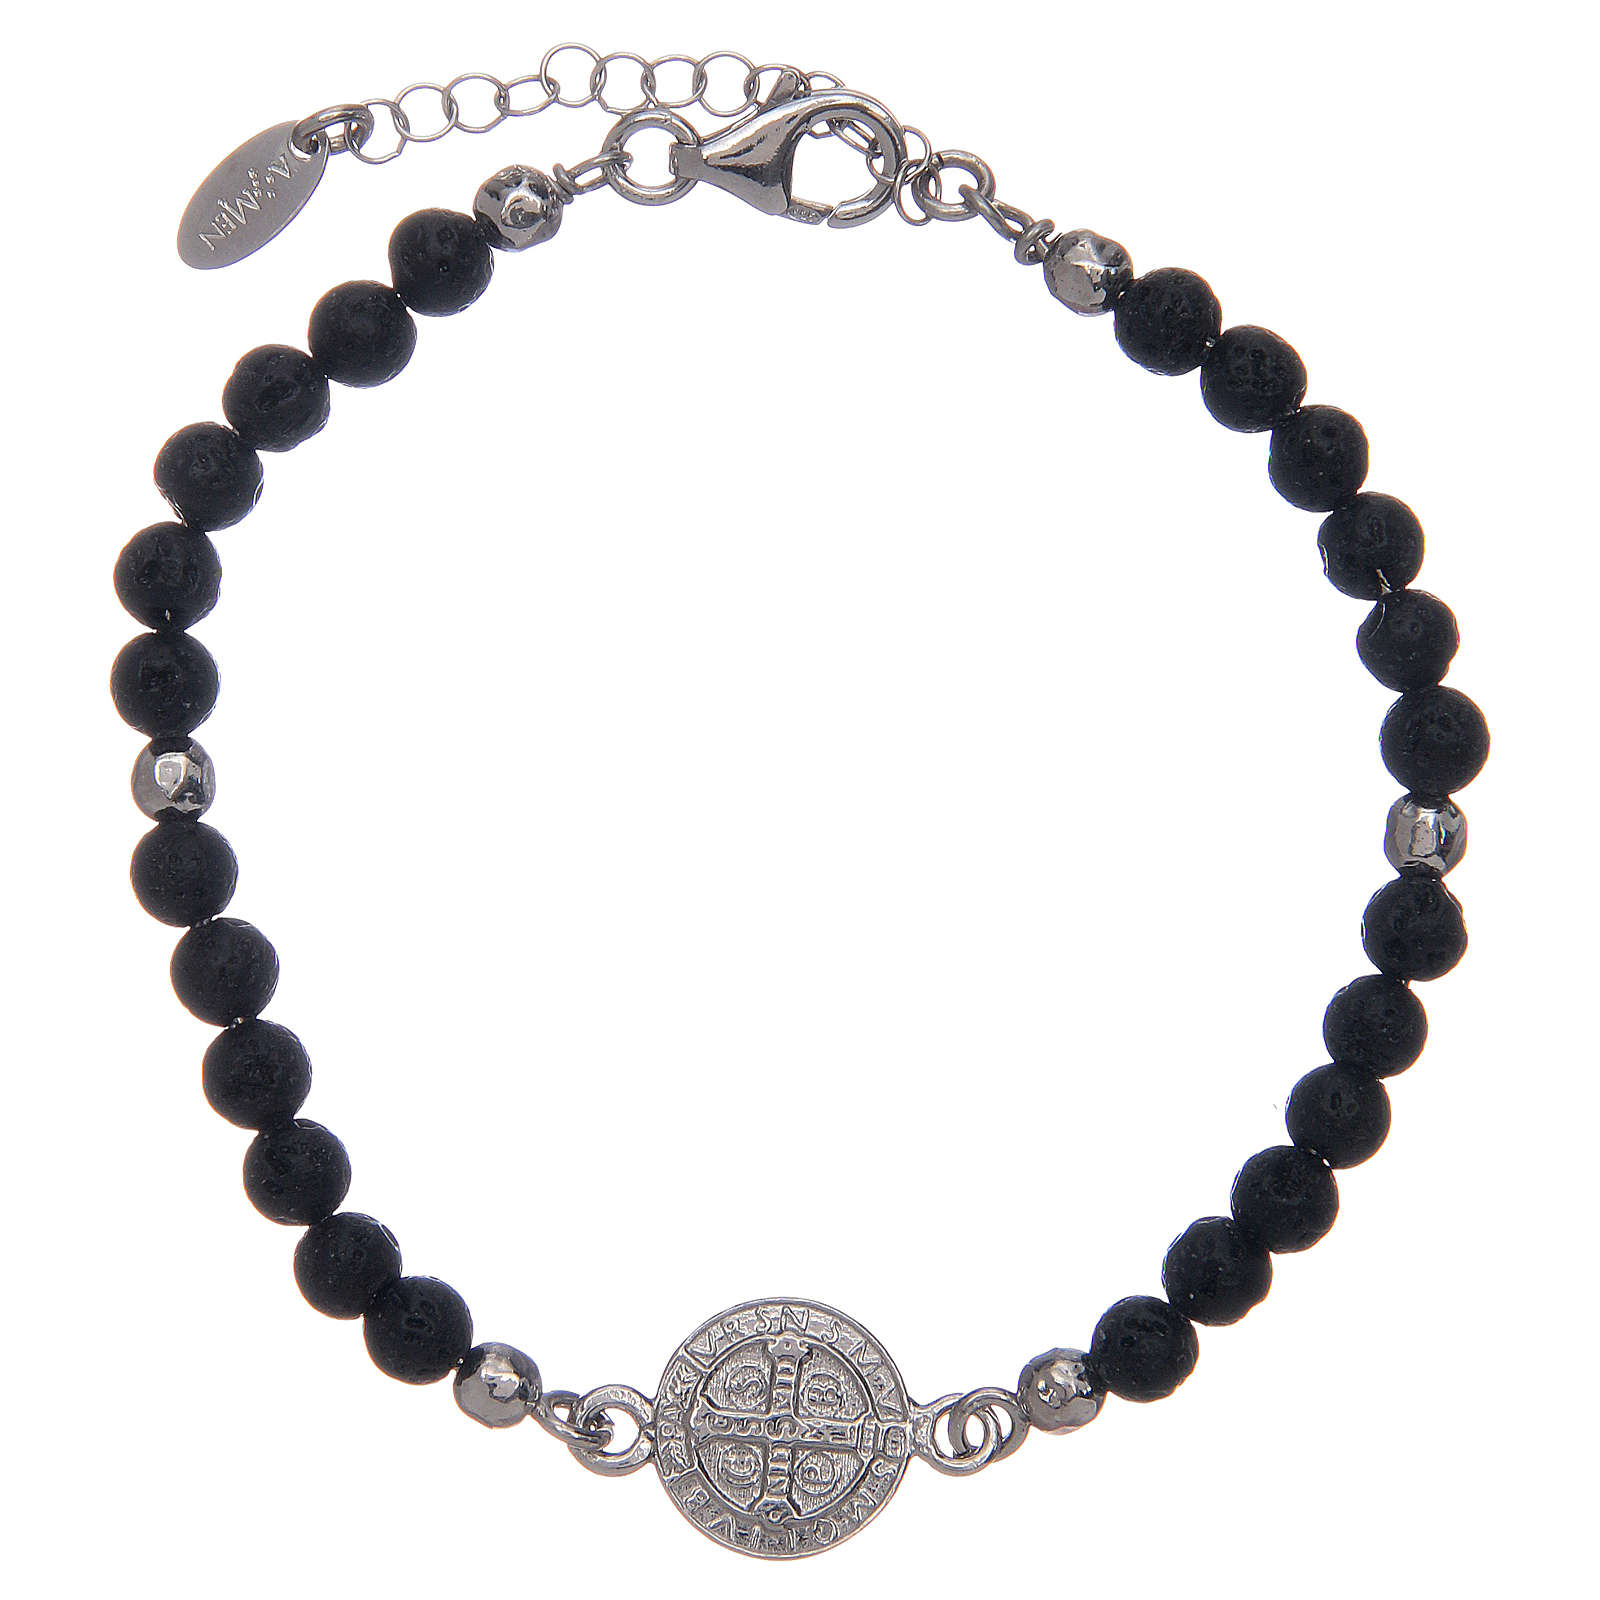 Saint Benedict medal bracelet with lava stone beads 4